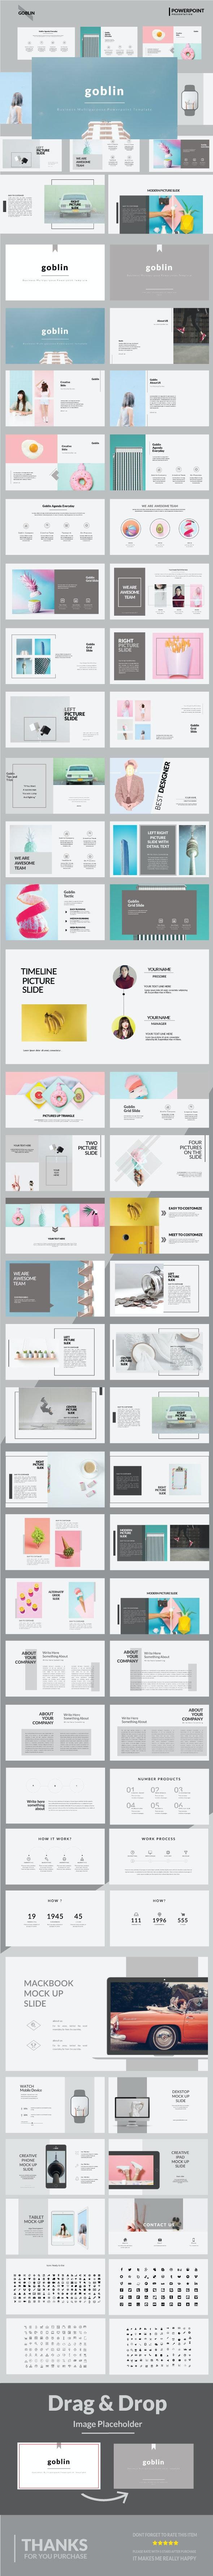 Goblin Multipurpose PowerPoint Template - Business PowerPoint Templates